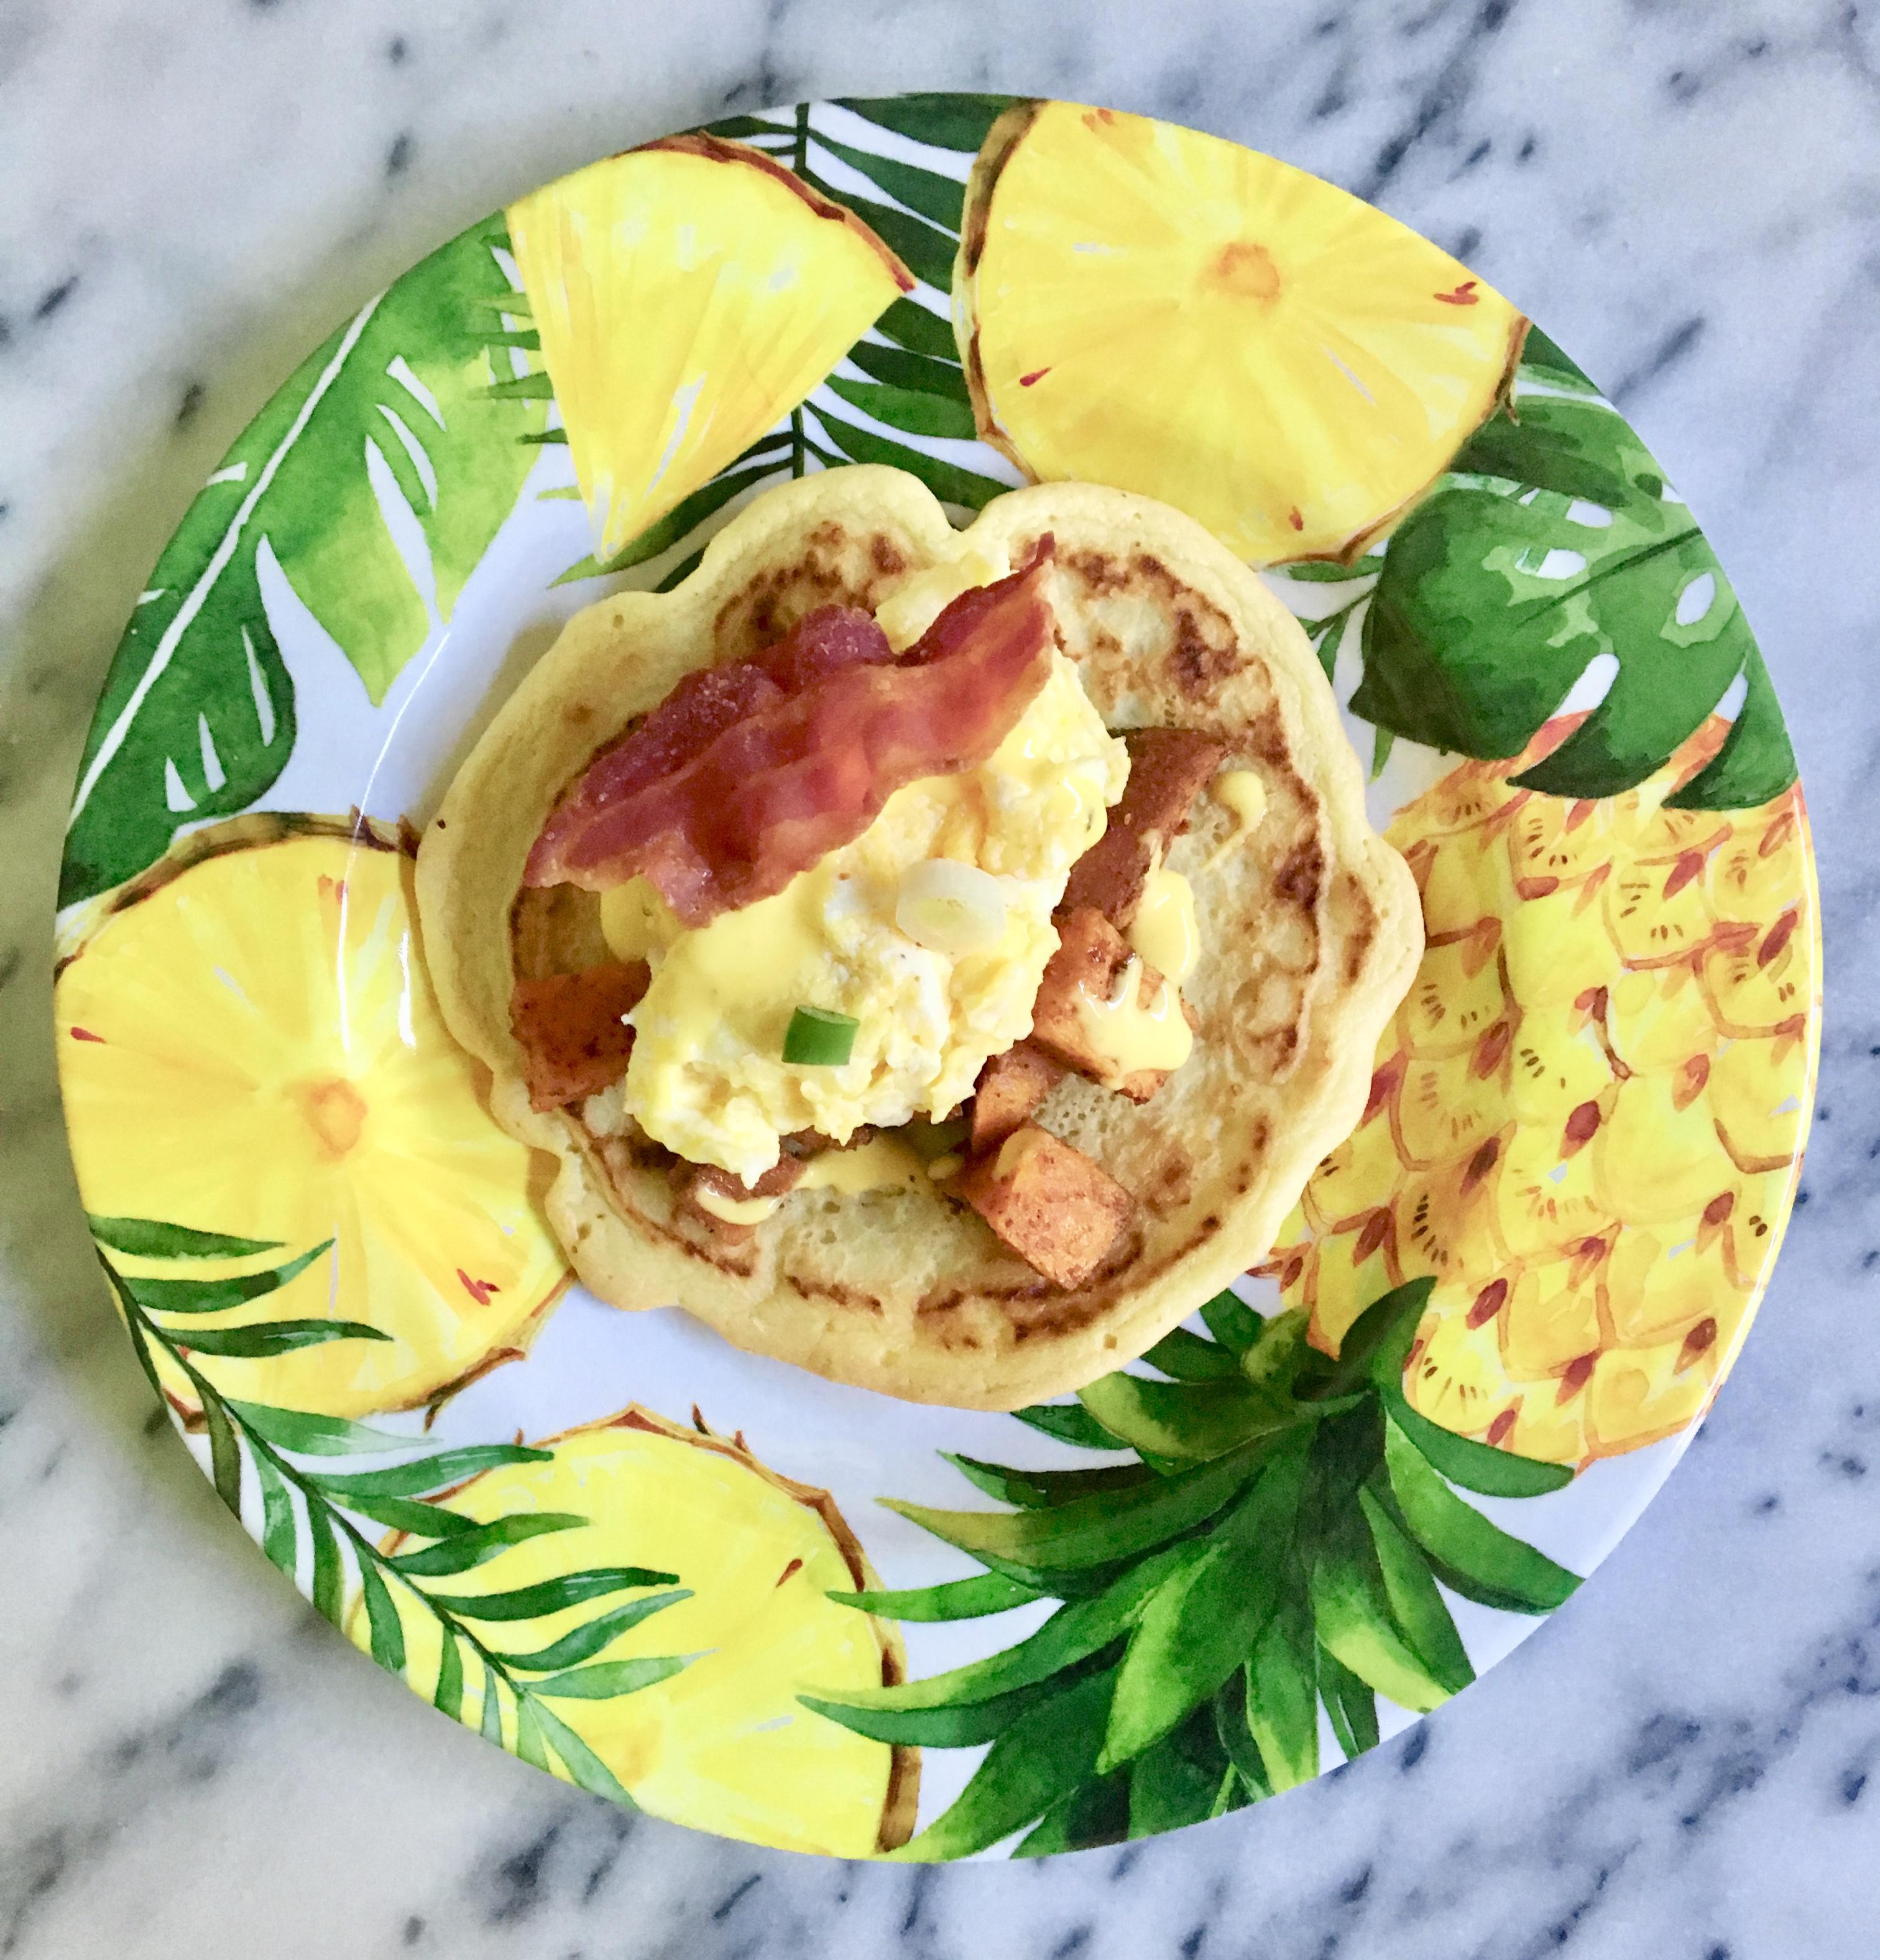 paleomg breakfast tacos | meal prep | food prep | paleo | eggs | sweet potatoes | Moving Mountains Wellness